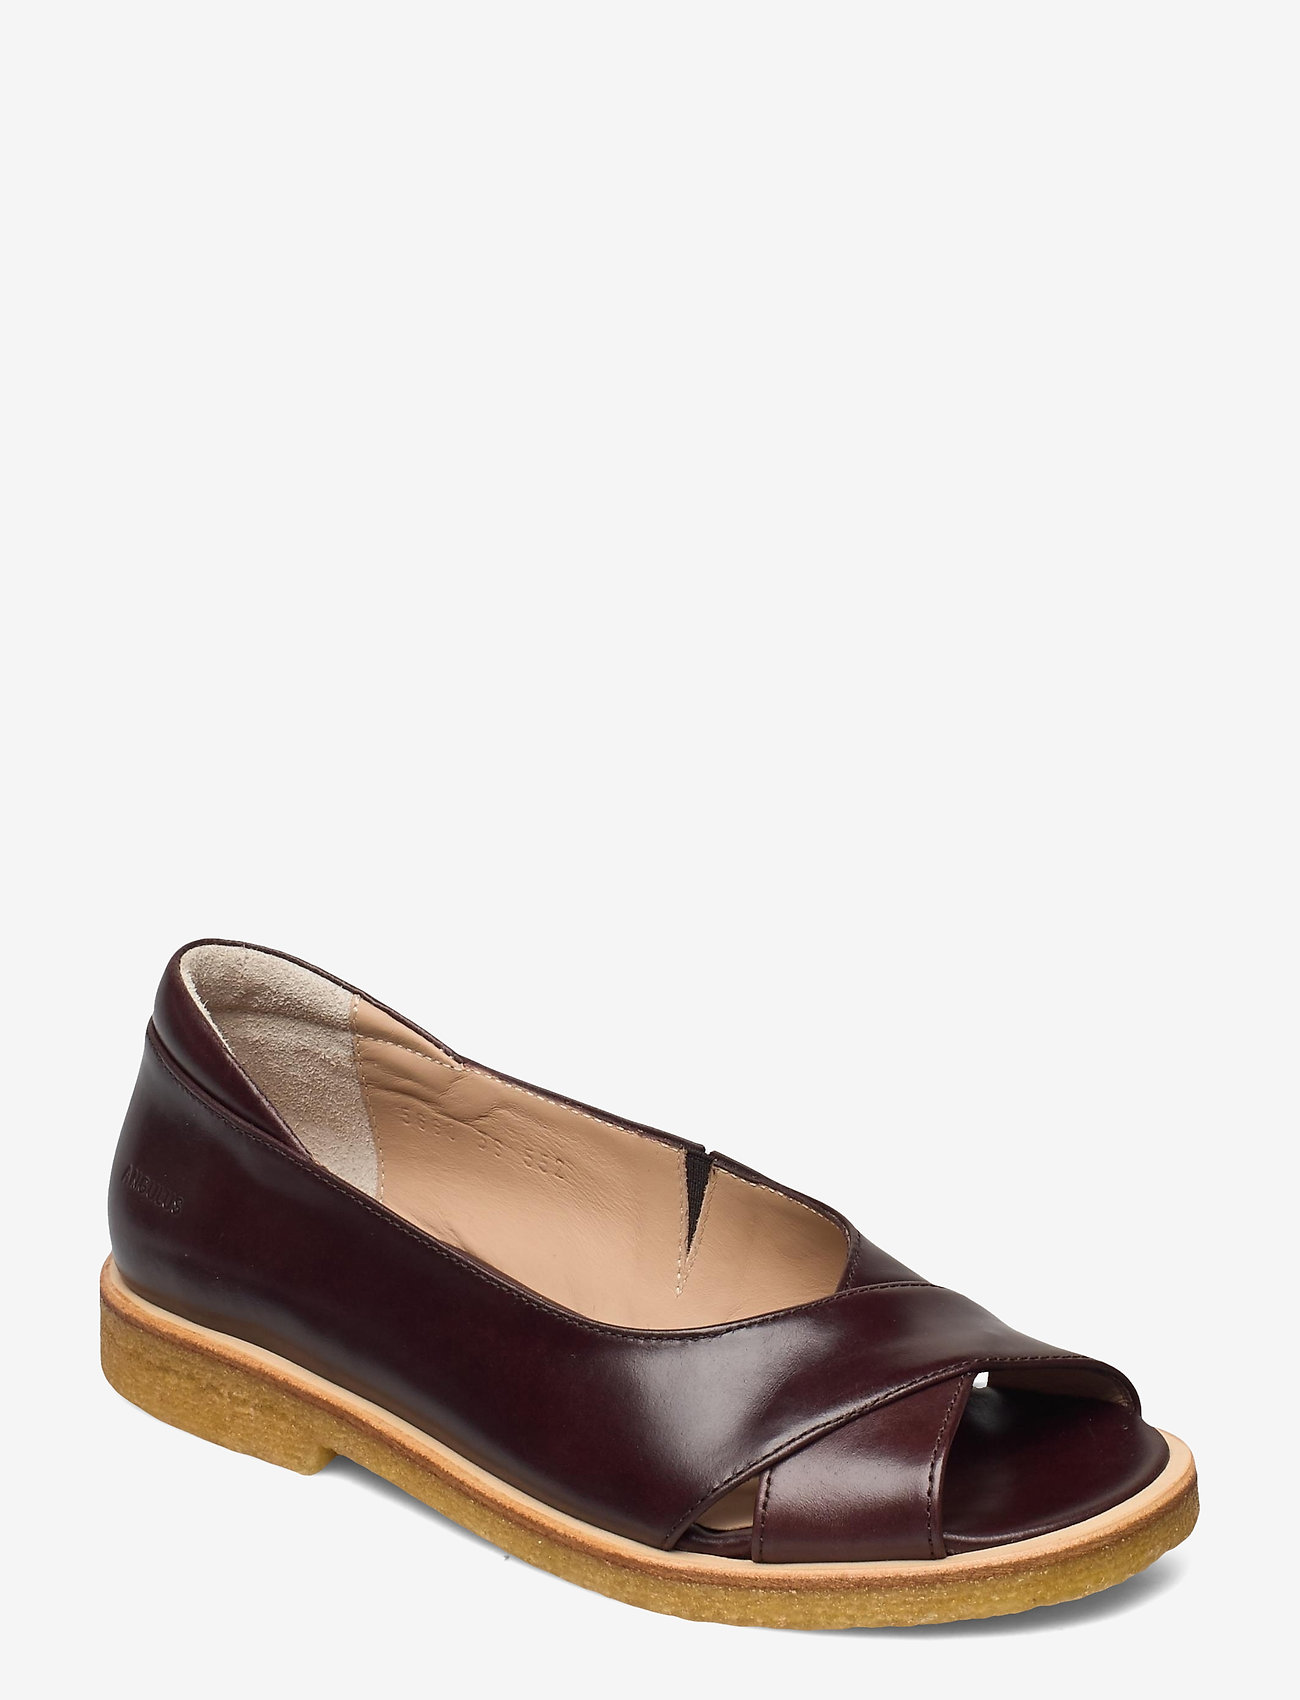 ANGULUS - Sandals - flat - open toe - clo - flache sandalen - 1836/002 dark brown/dark brown - 0